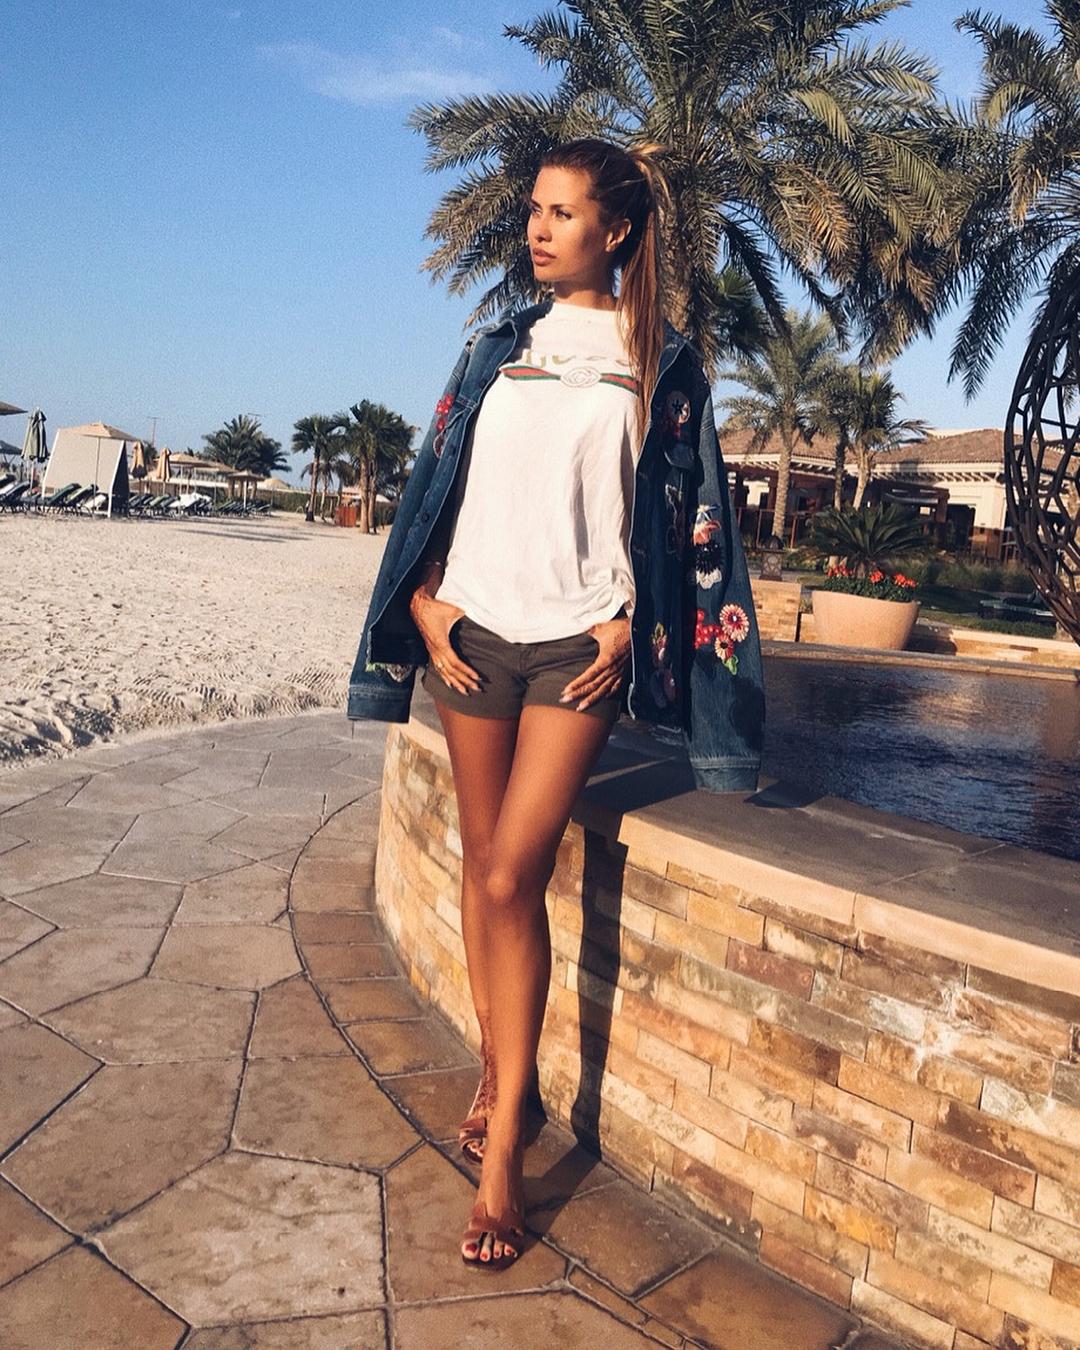 Feet Victoria Bonya nude (71 photos), Topless, Paparazzi, Instagram, cleavage 2020